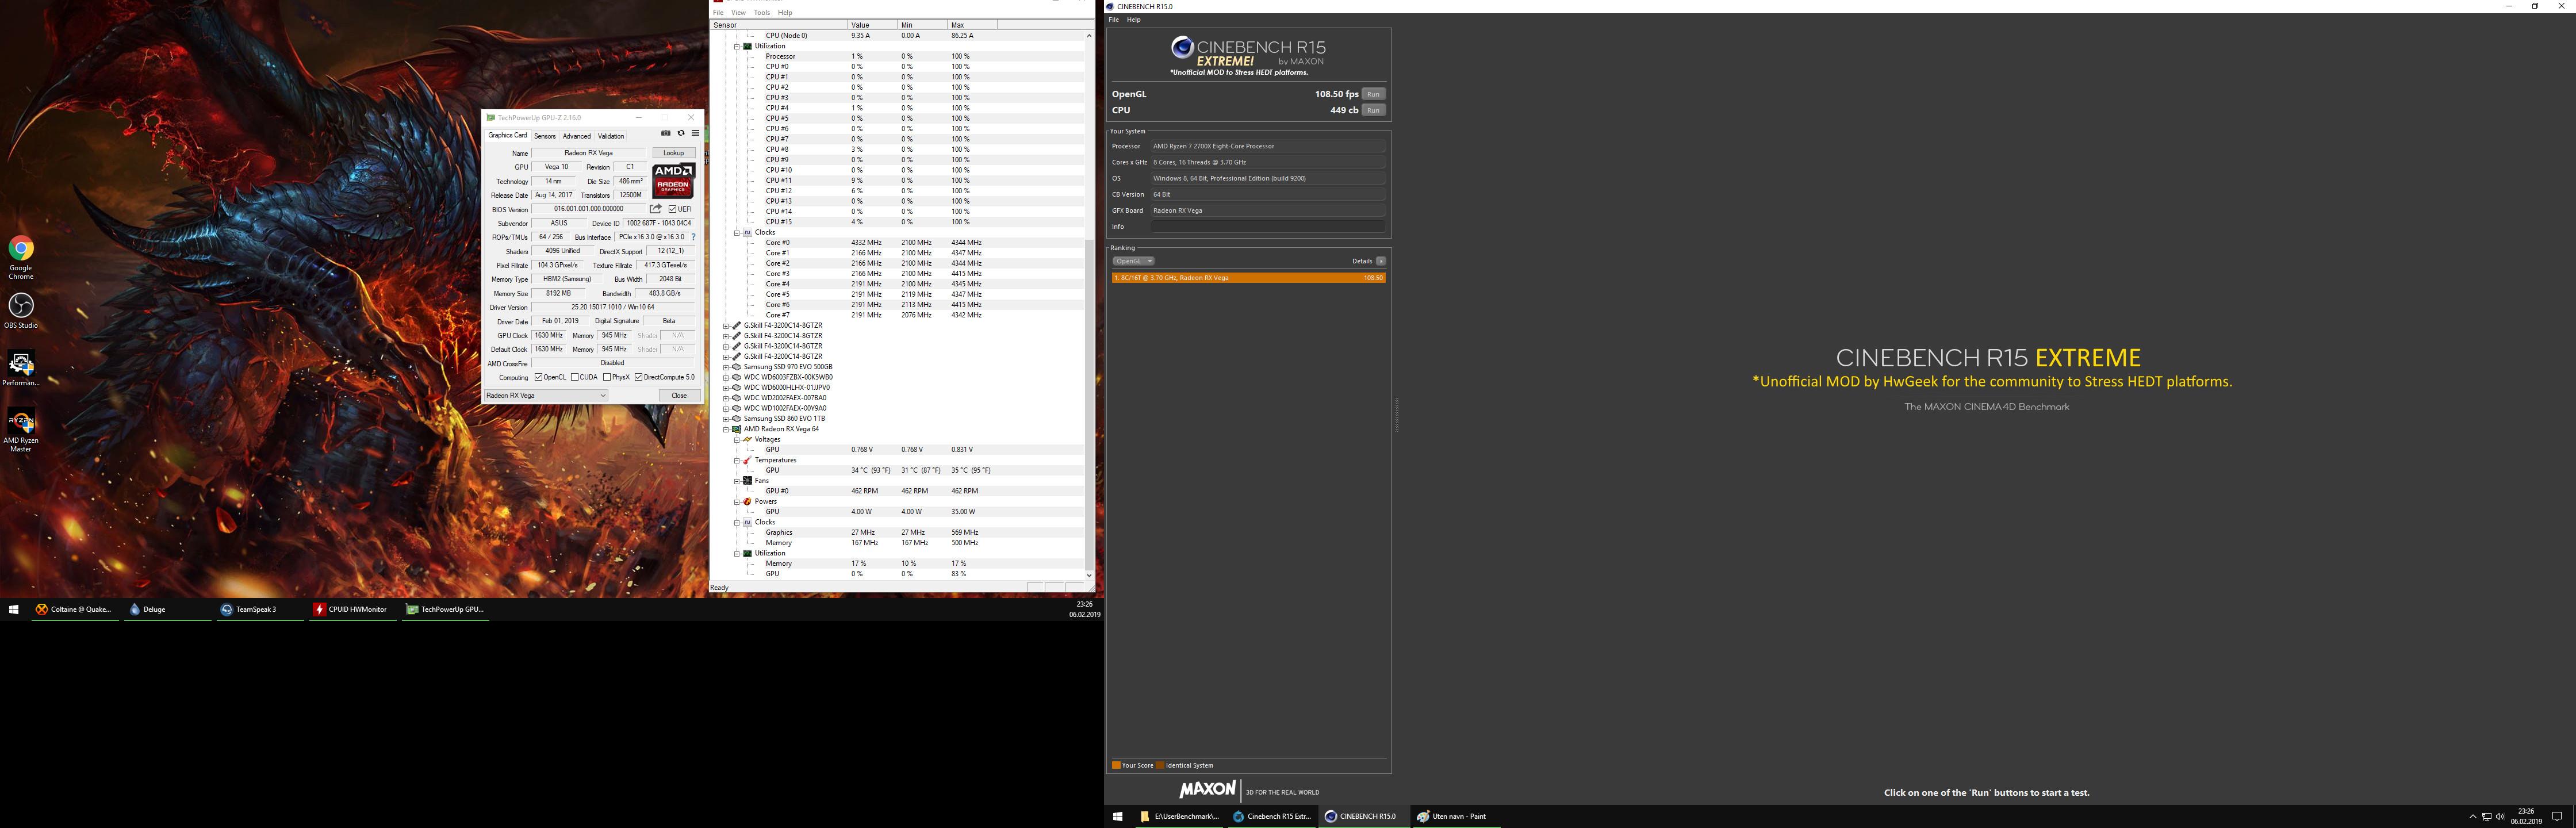 Cinebench R15 Extreme! AND Cinebench R20 - Benchmarking Thread - CPU